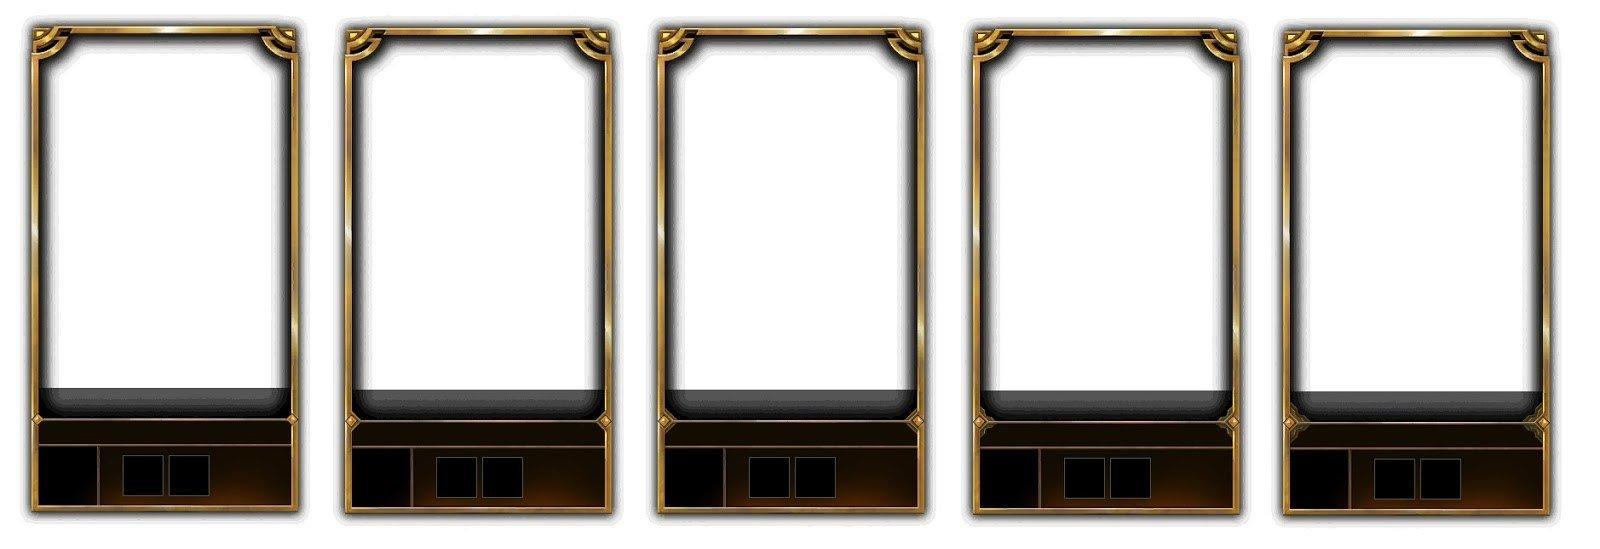 Gold Loading Screen Border